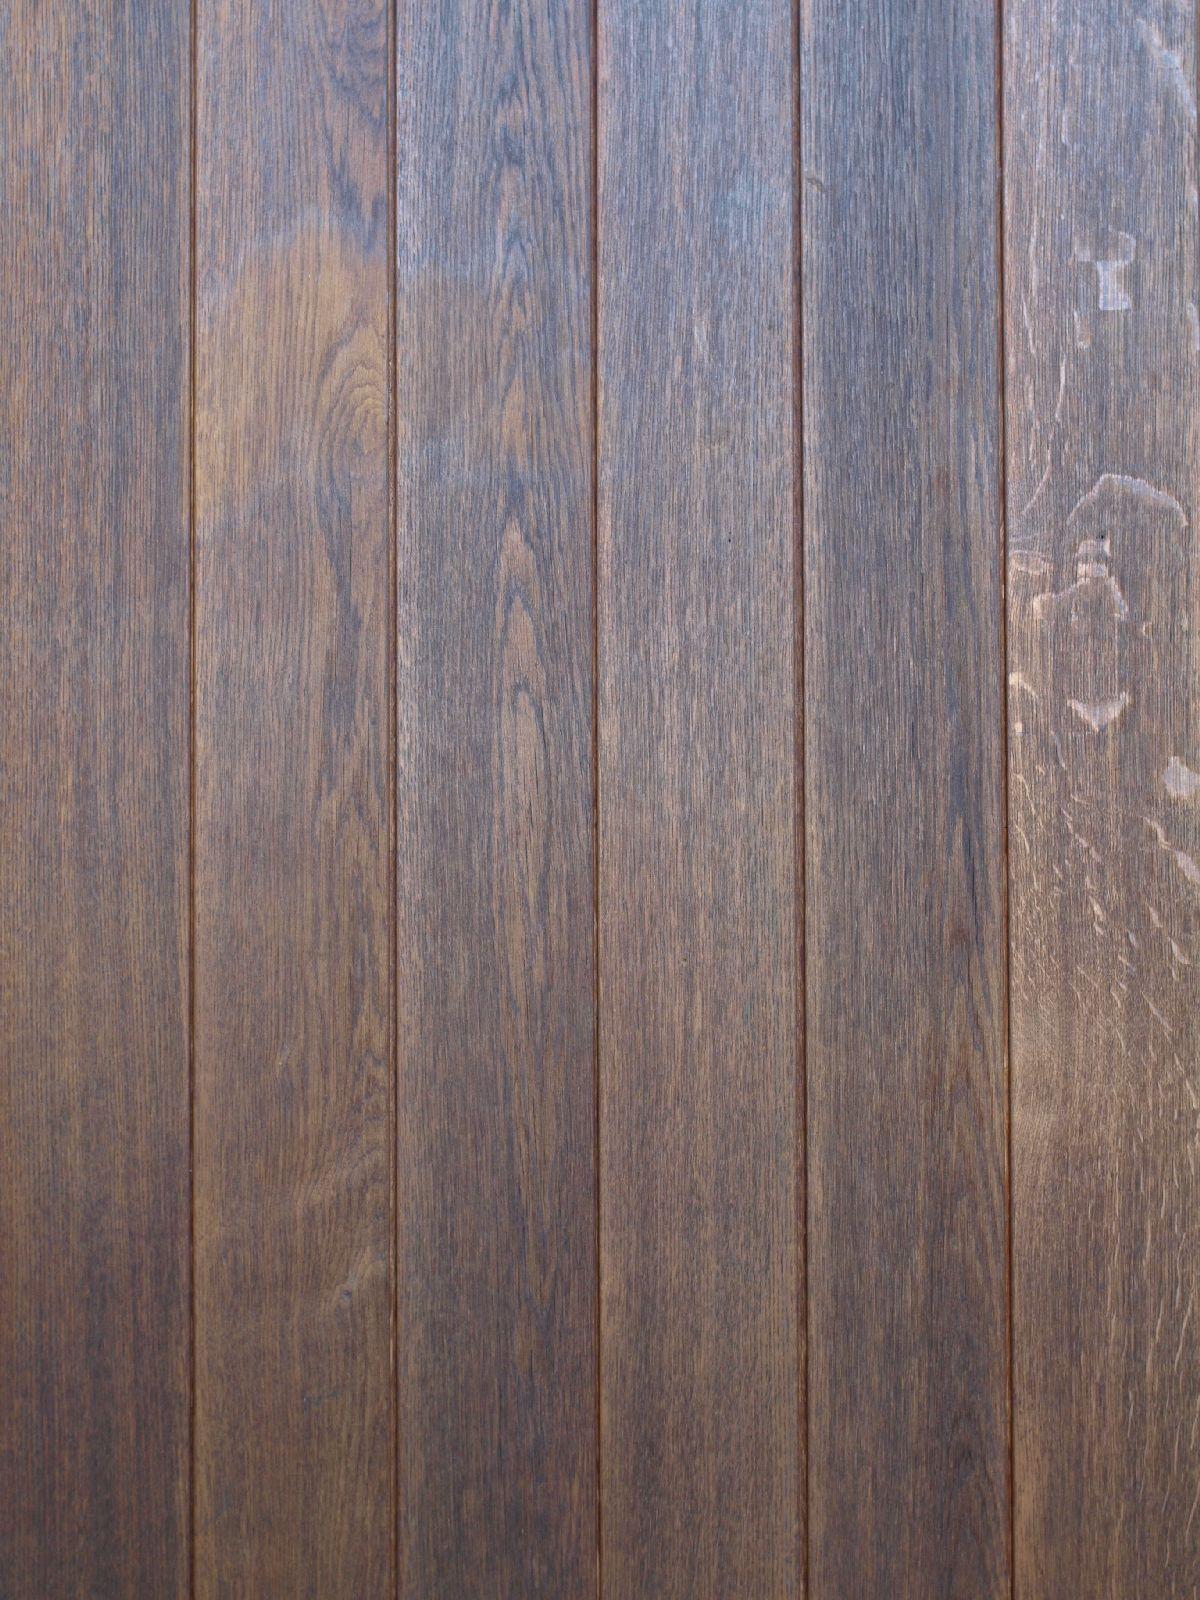 Wood_Texture_A_P4120988